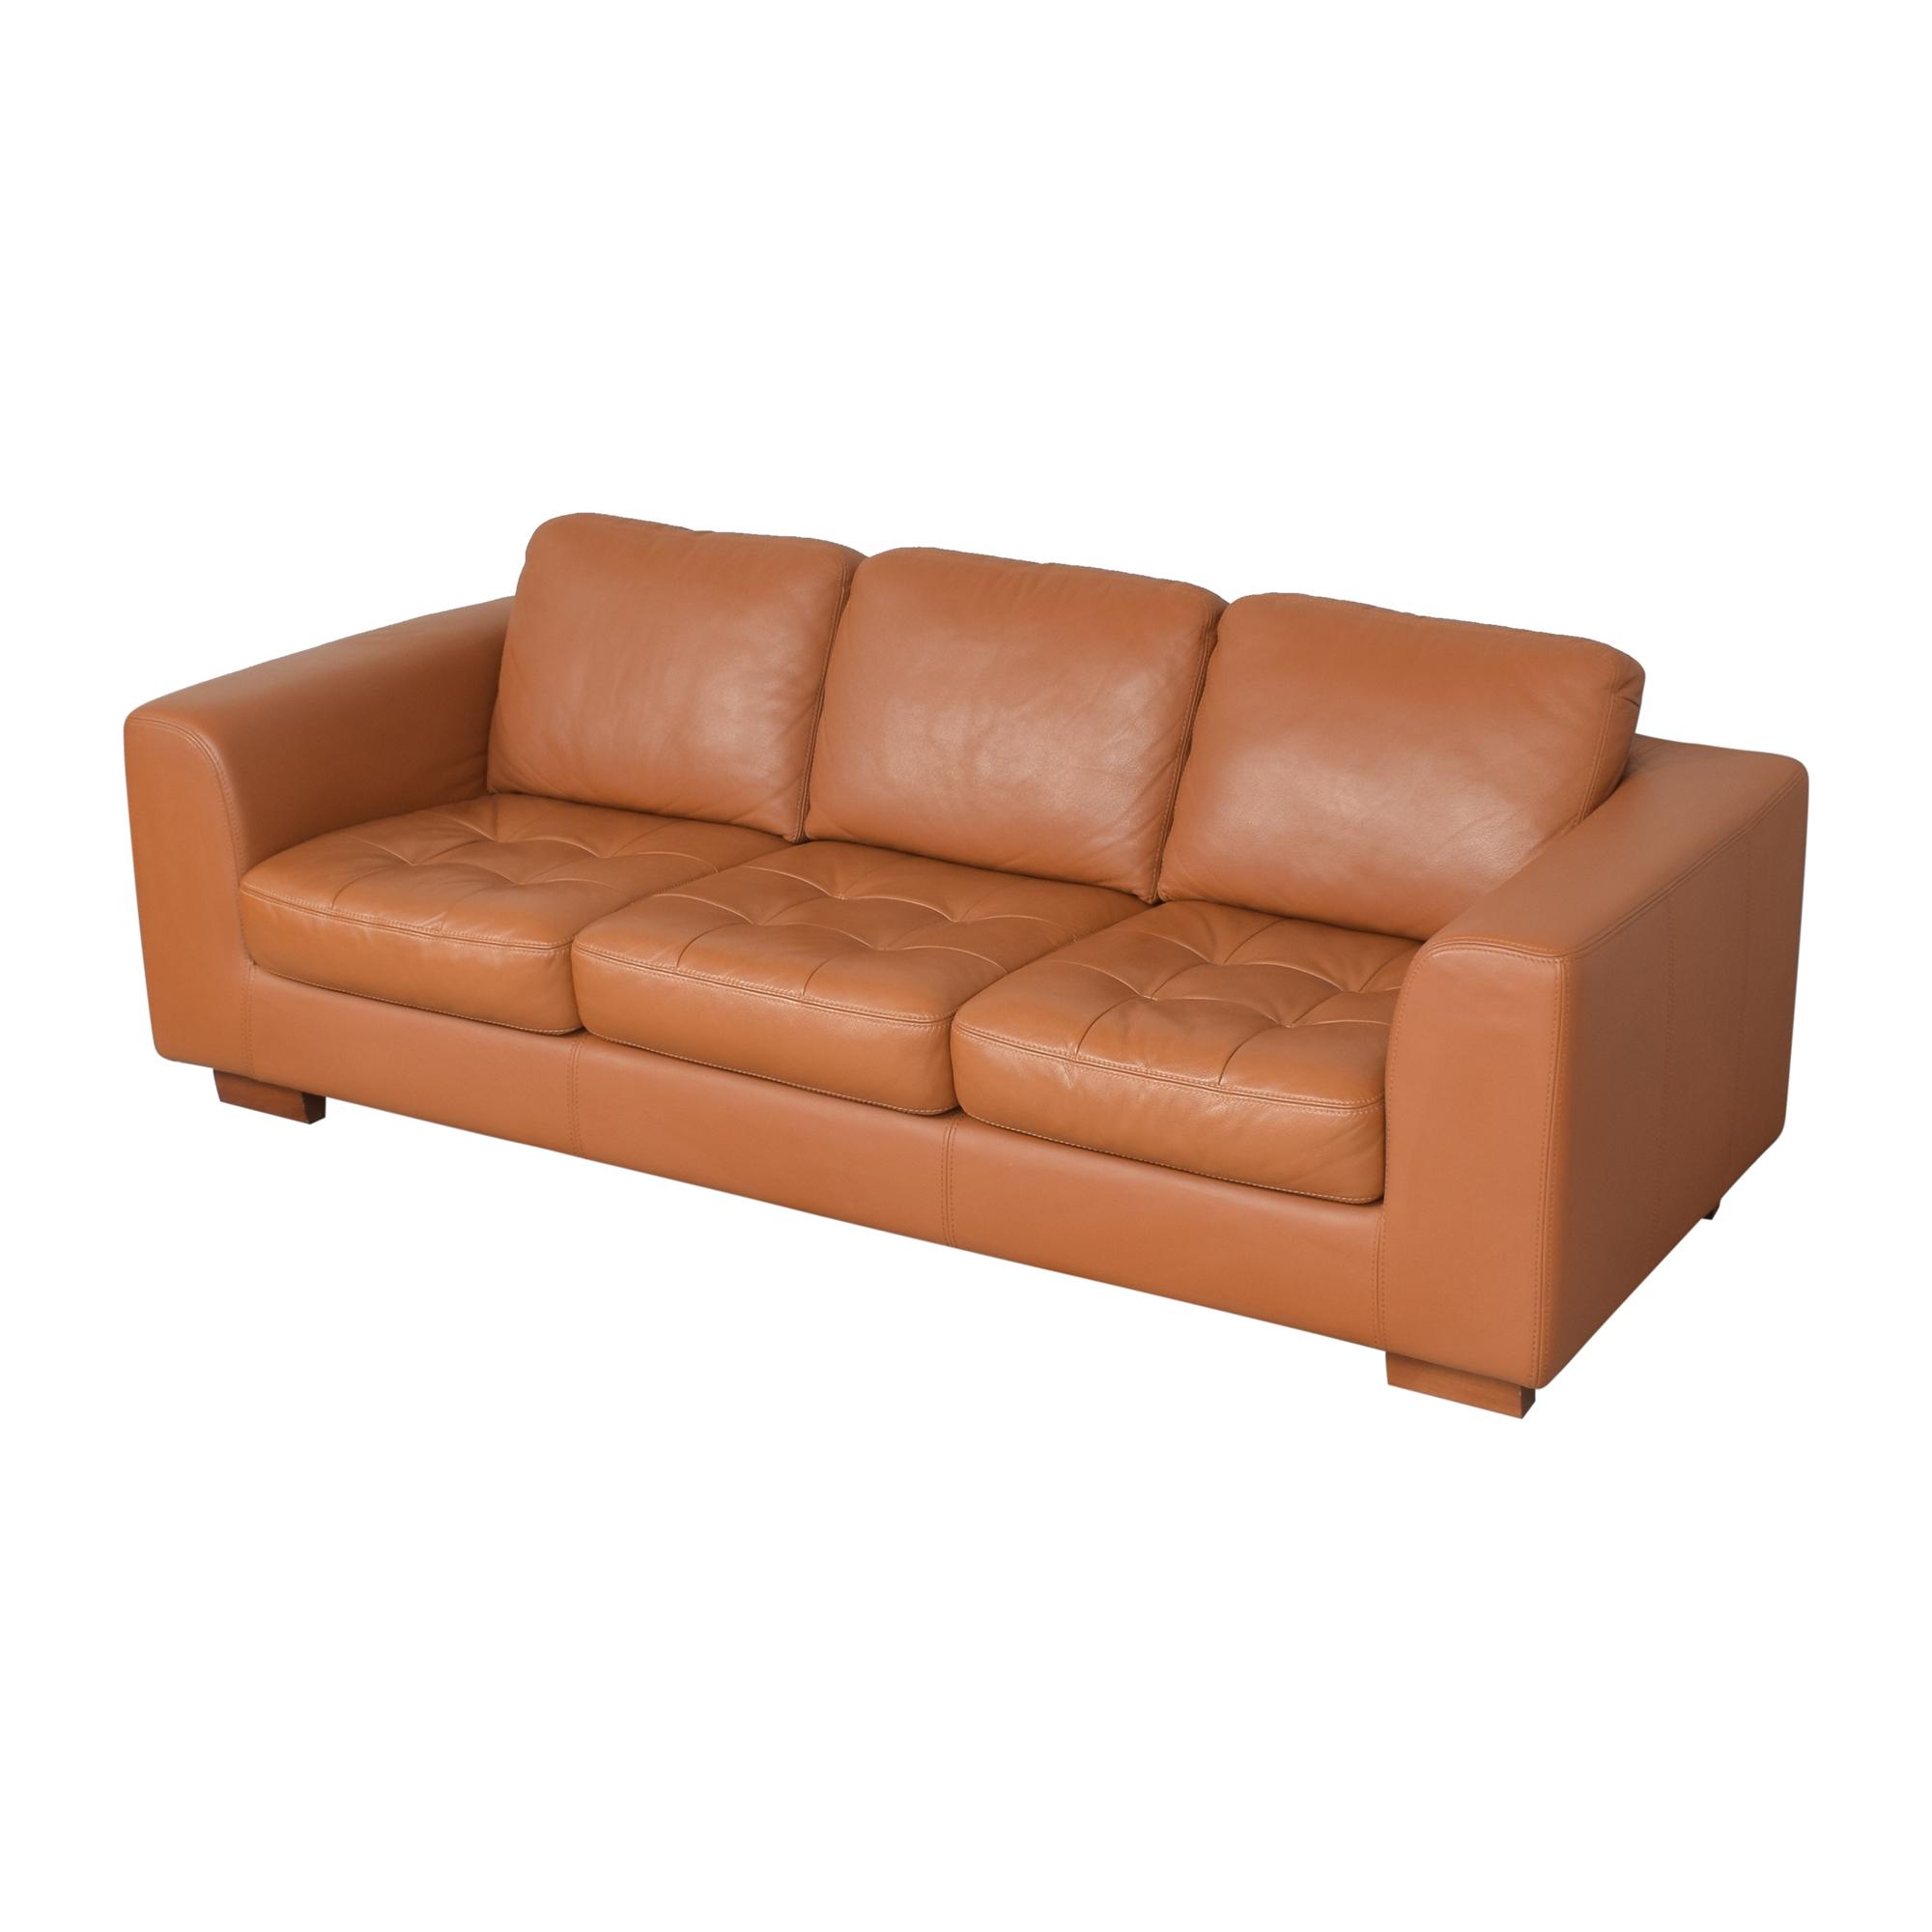 W. Schillig Three Cushion Sofa / Classic Sofas